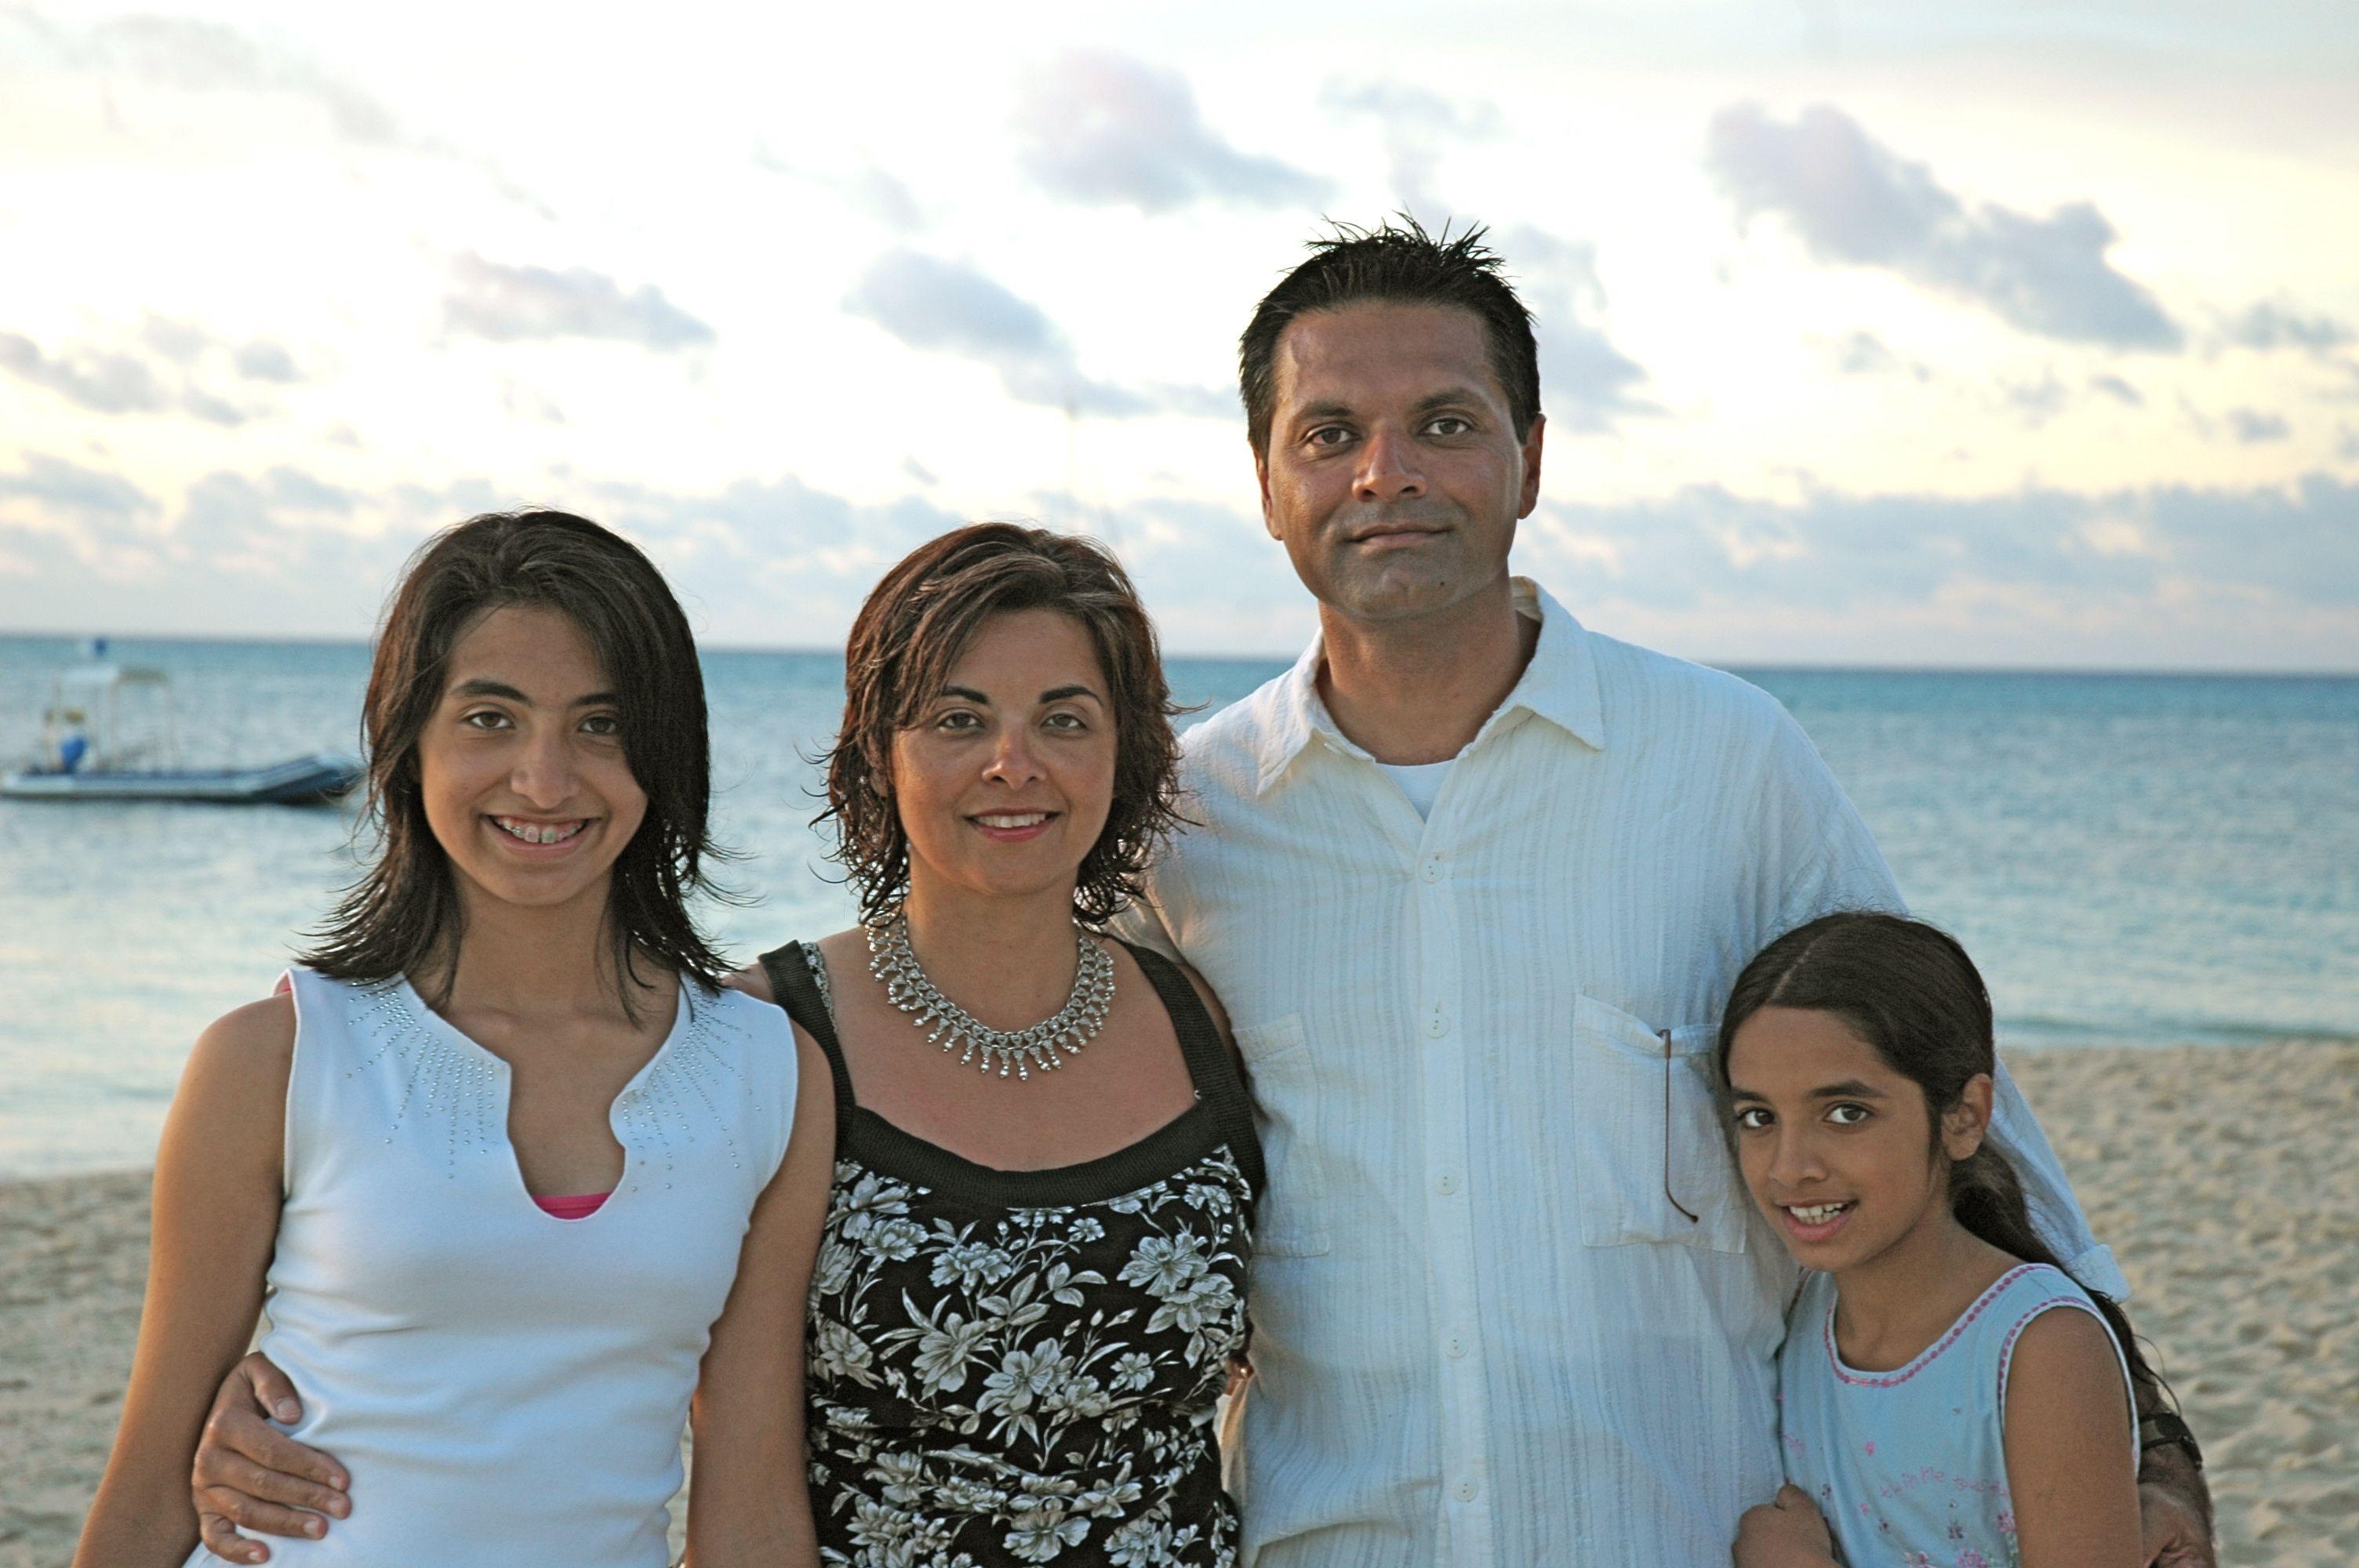 Arif Babul with wife Naznin and daughters Aliya-Nur (left) and Shazia 'Ayn